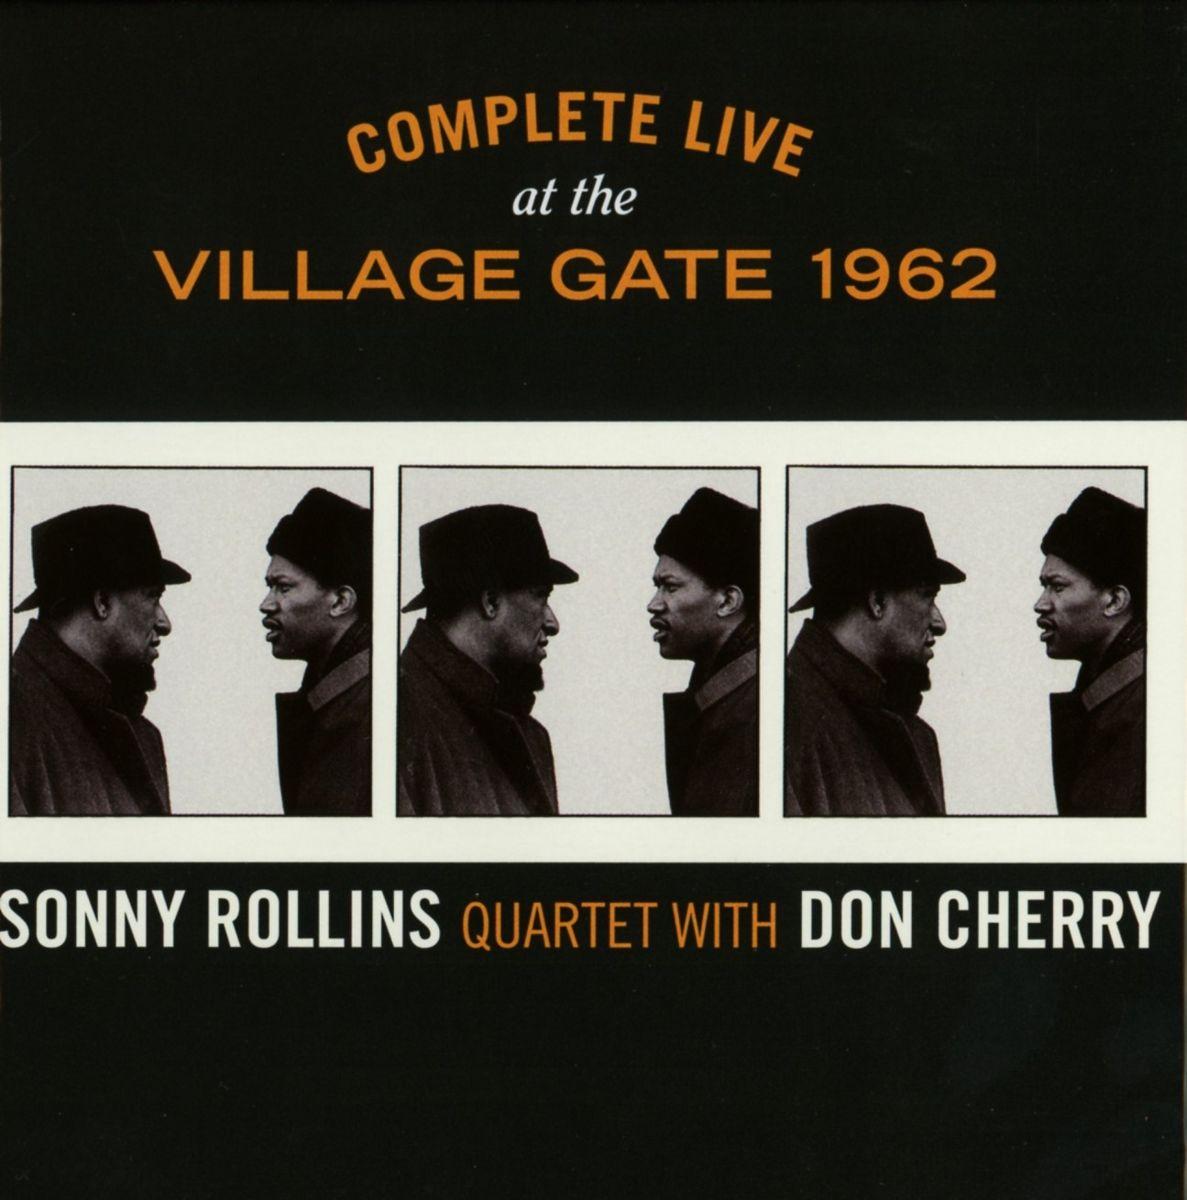 Sonny Rollins Quartet/Don Cherry</br>Complete Live At The Village Gate 1962</br>Solar, 2015